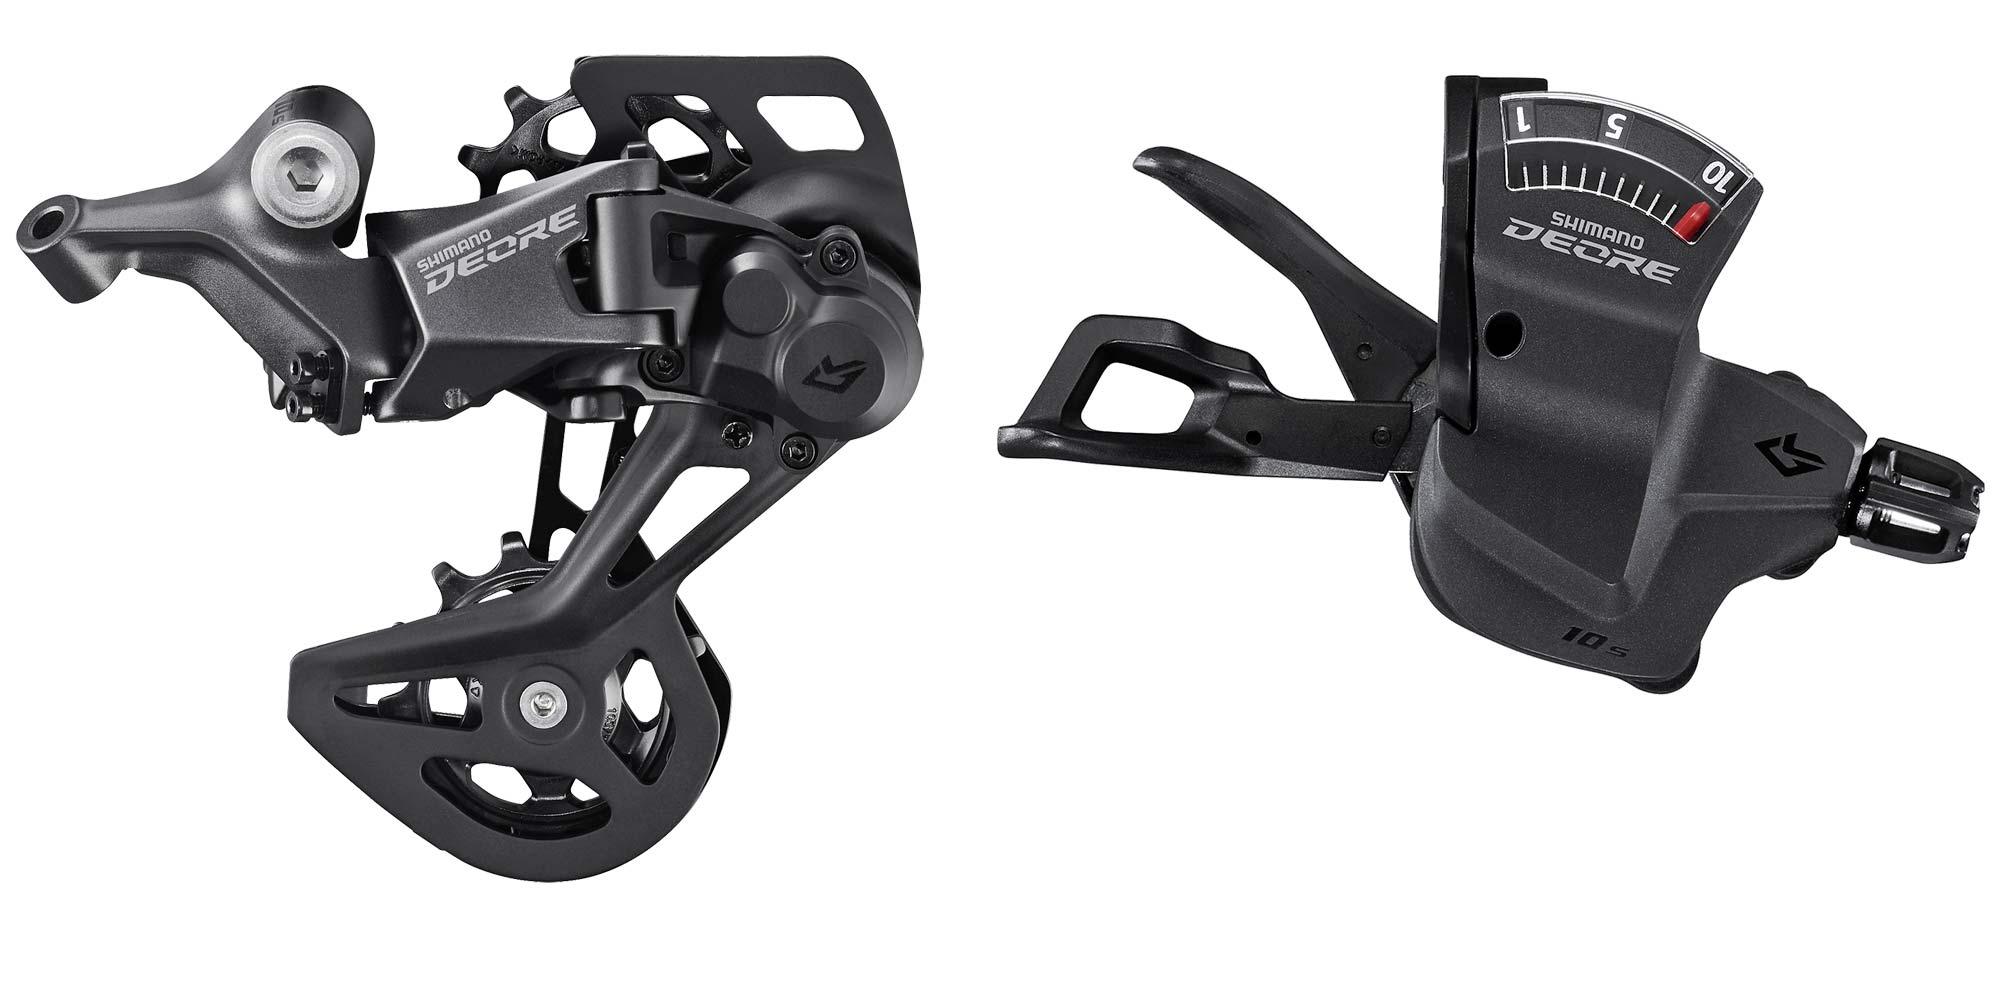 Shimano Deore XT LinkGlide drivetrain is 3x more durable, new LG MTB long-wearing mountain bike groupset,Deore 1x10